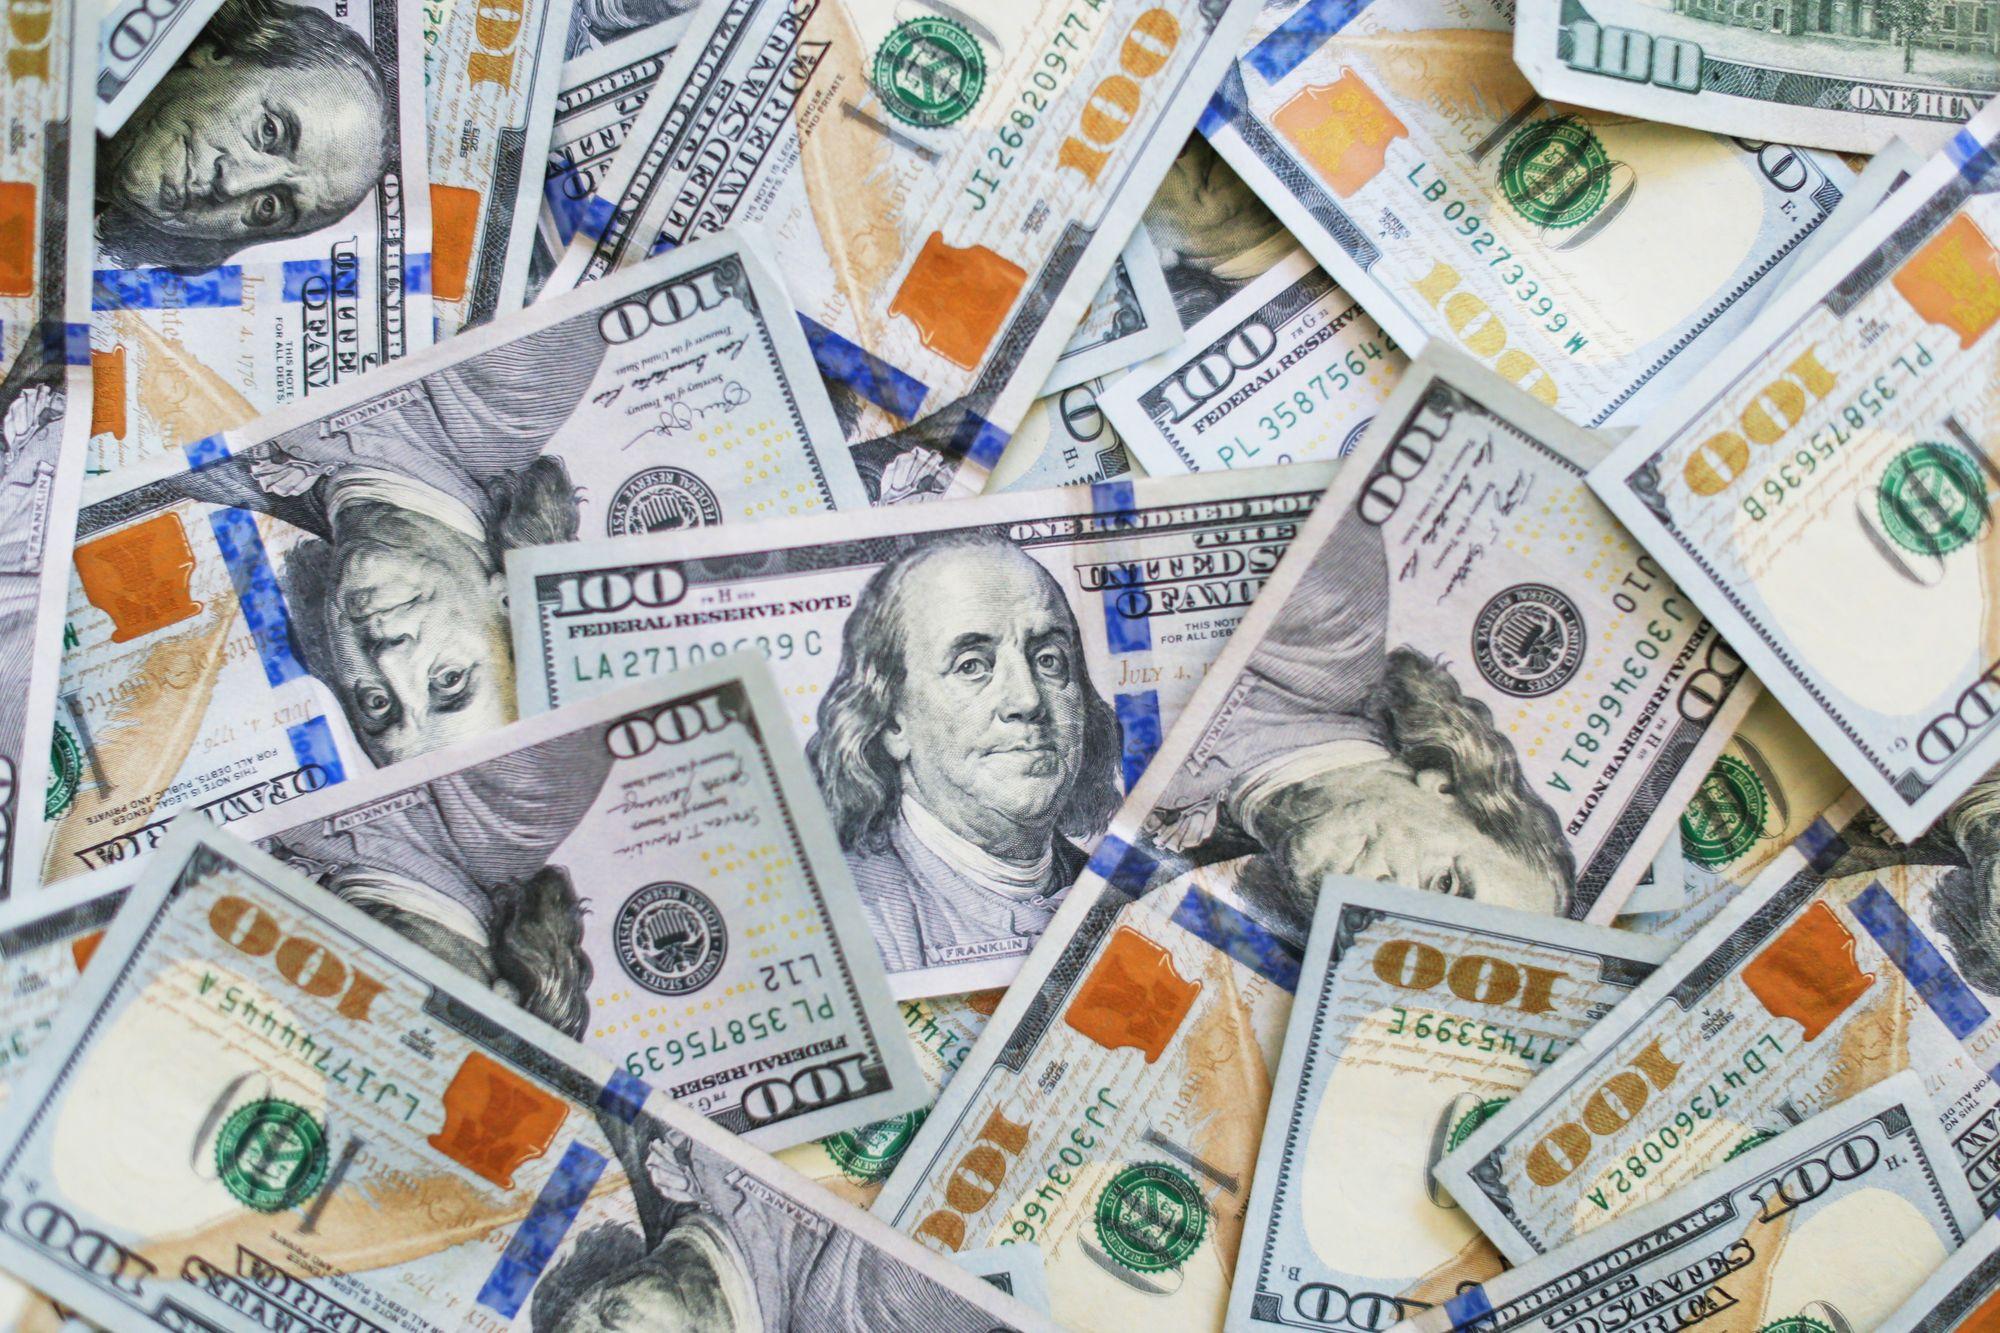 motivation through money - managing performance